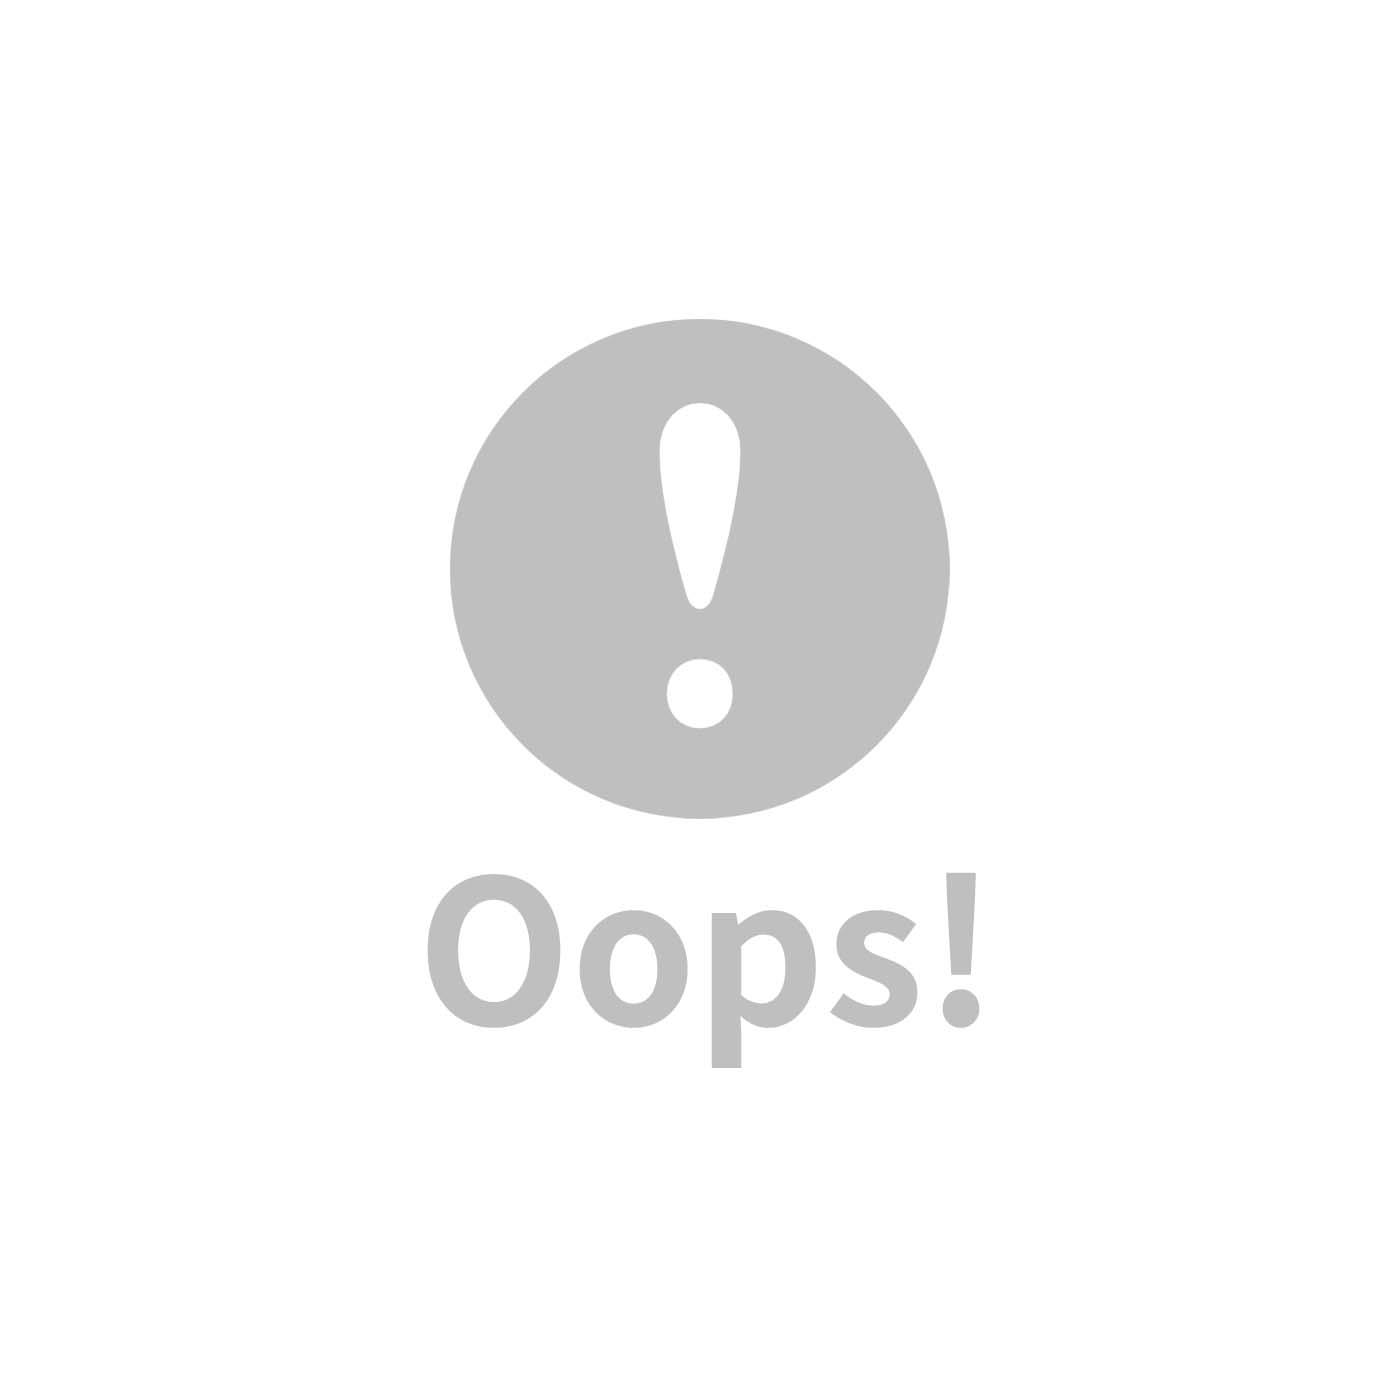 La Millou Jersey時尚篷篷浴巾_標準0-2Y- 瑜珈珈樹懶(粉嫩糖果綠)